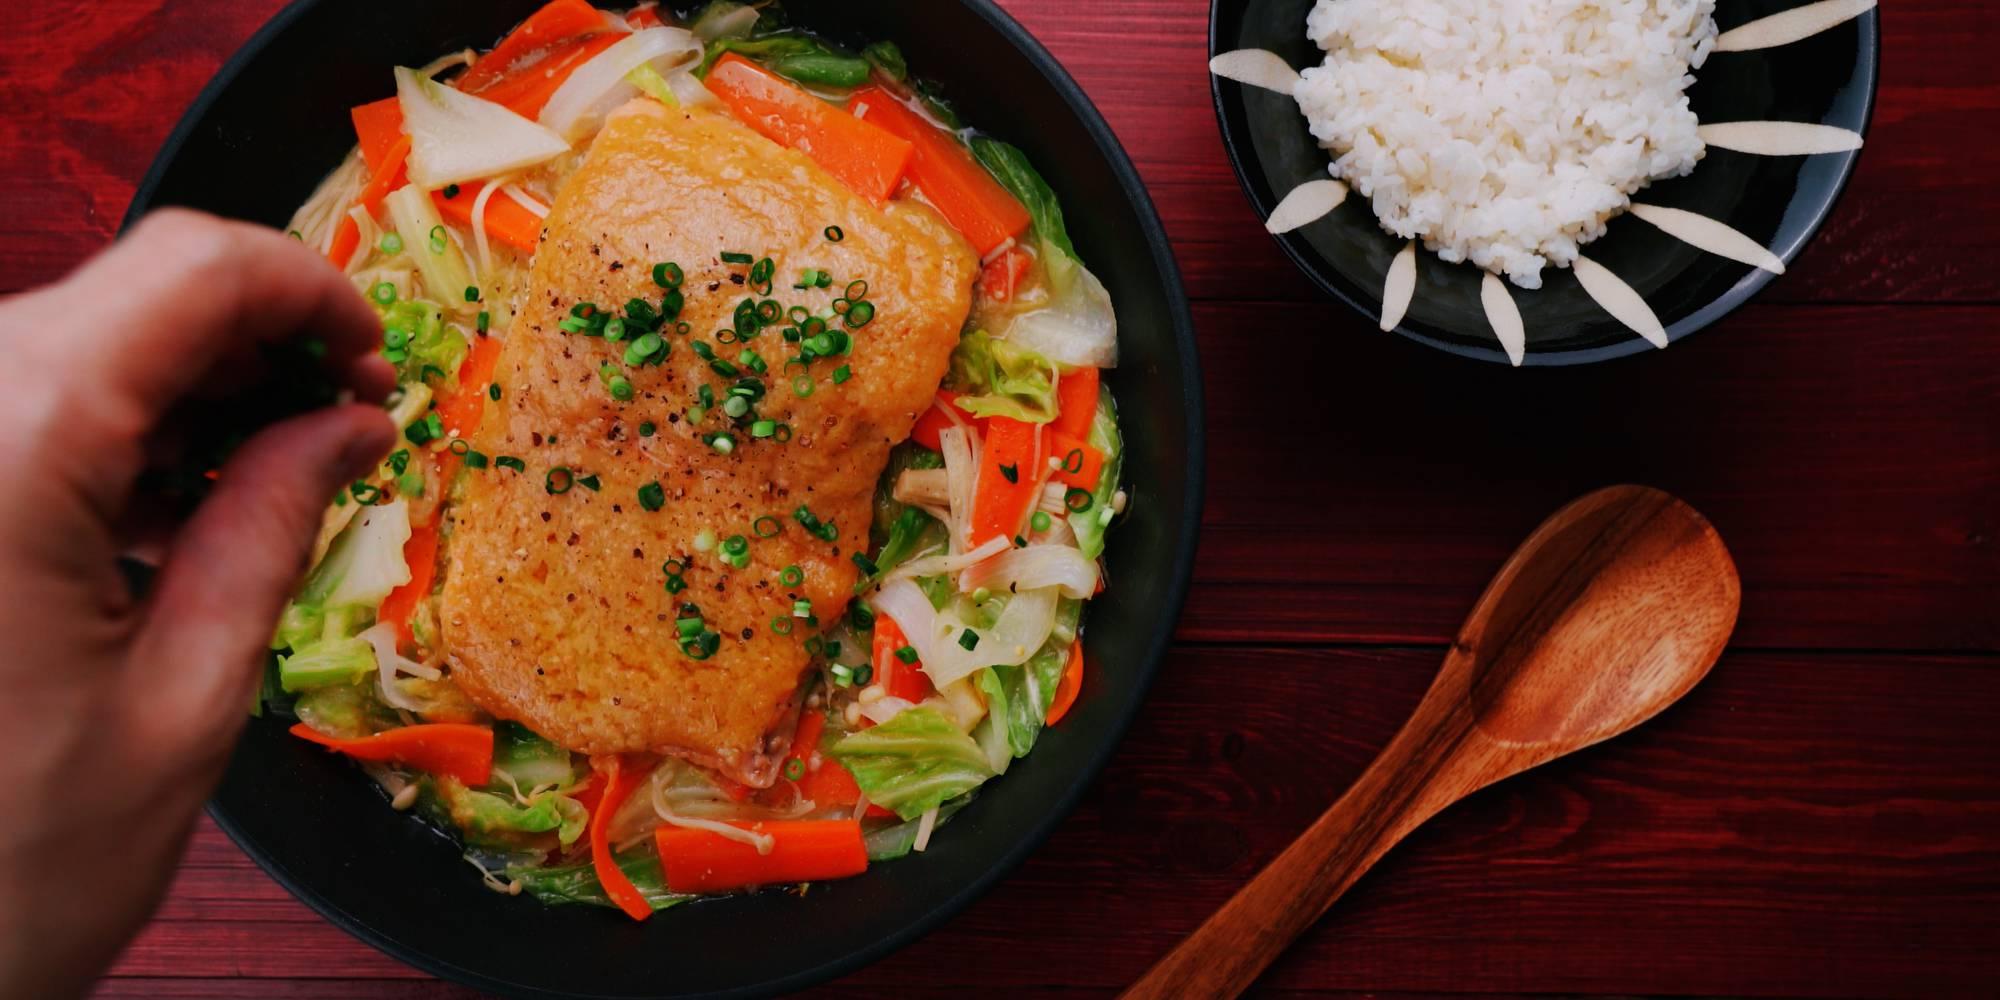 Garnishing Chan Chan Yaki with scallions and black pepper.